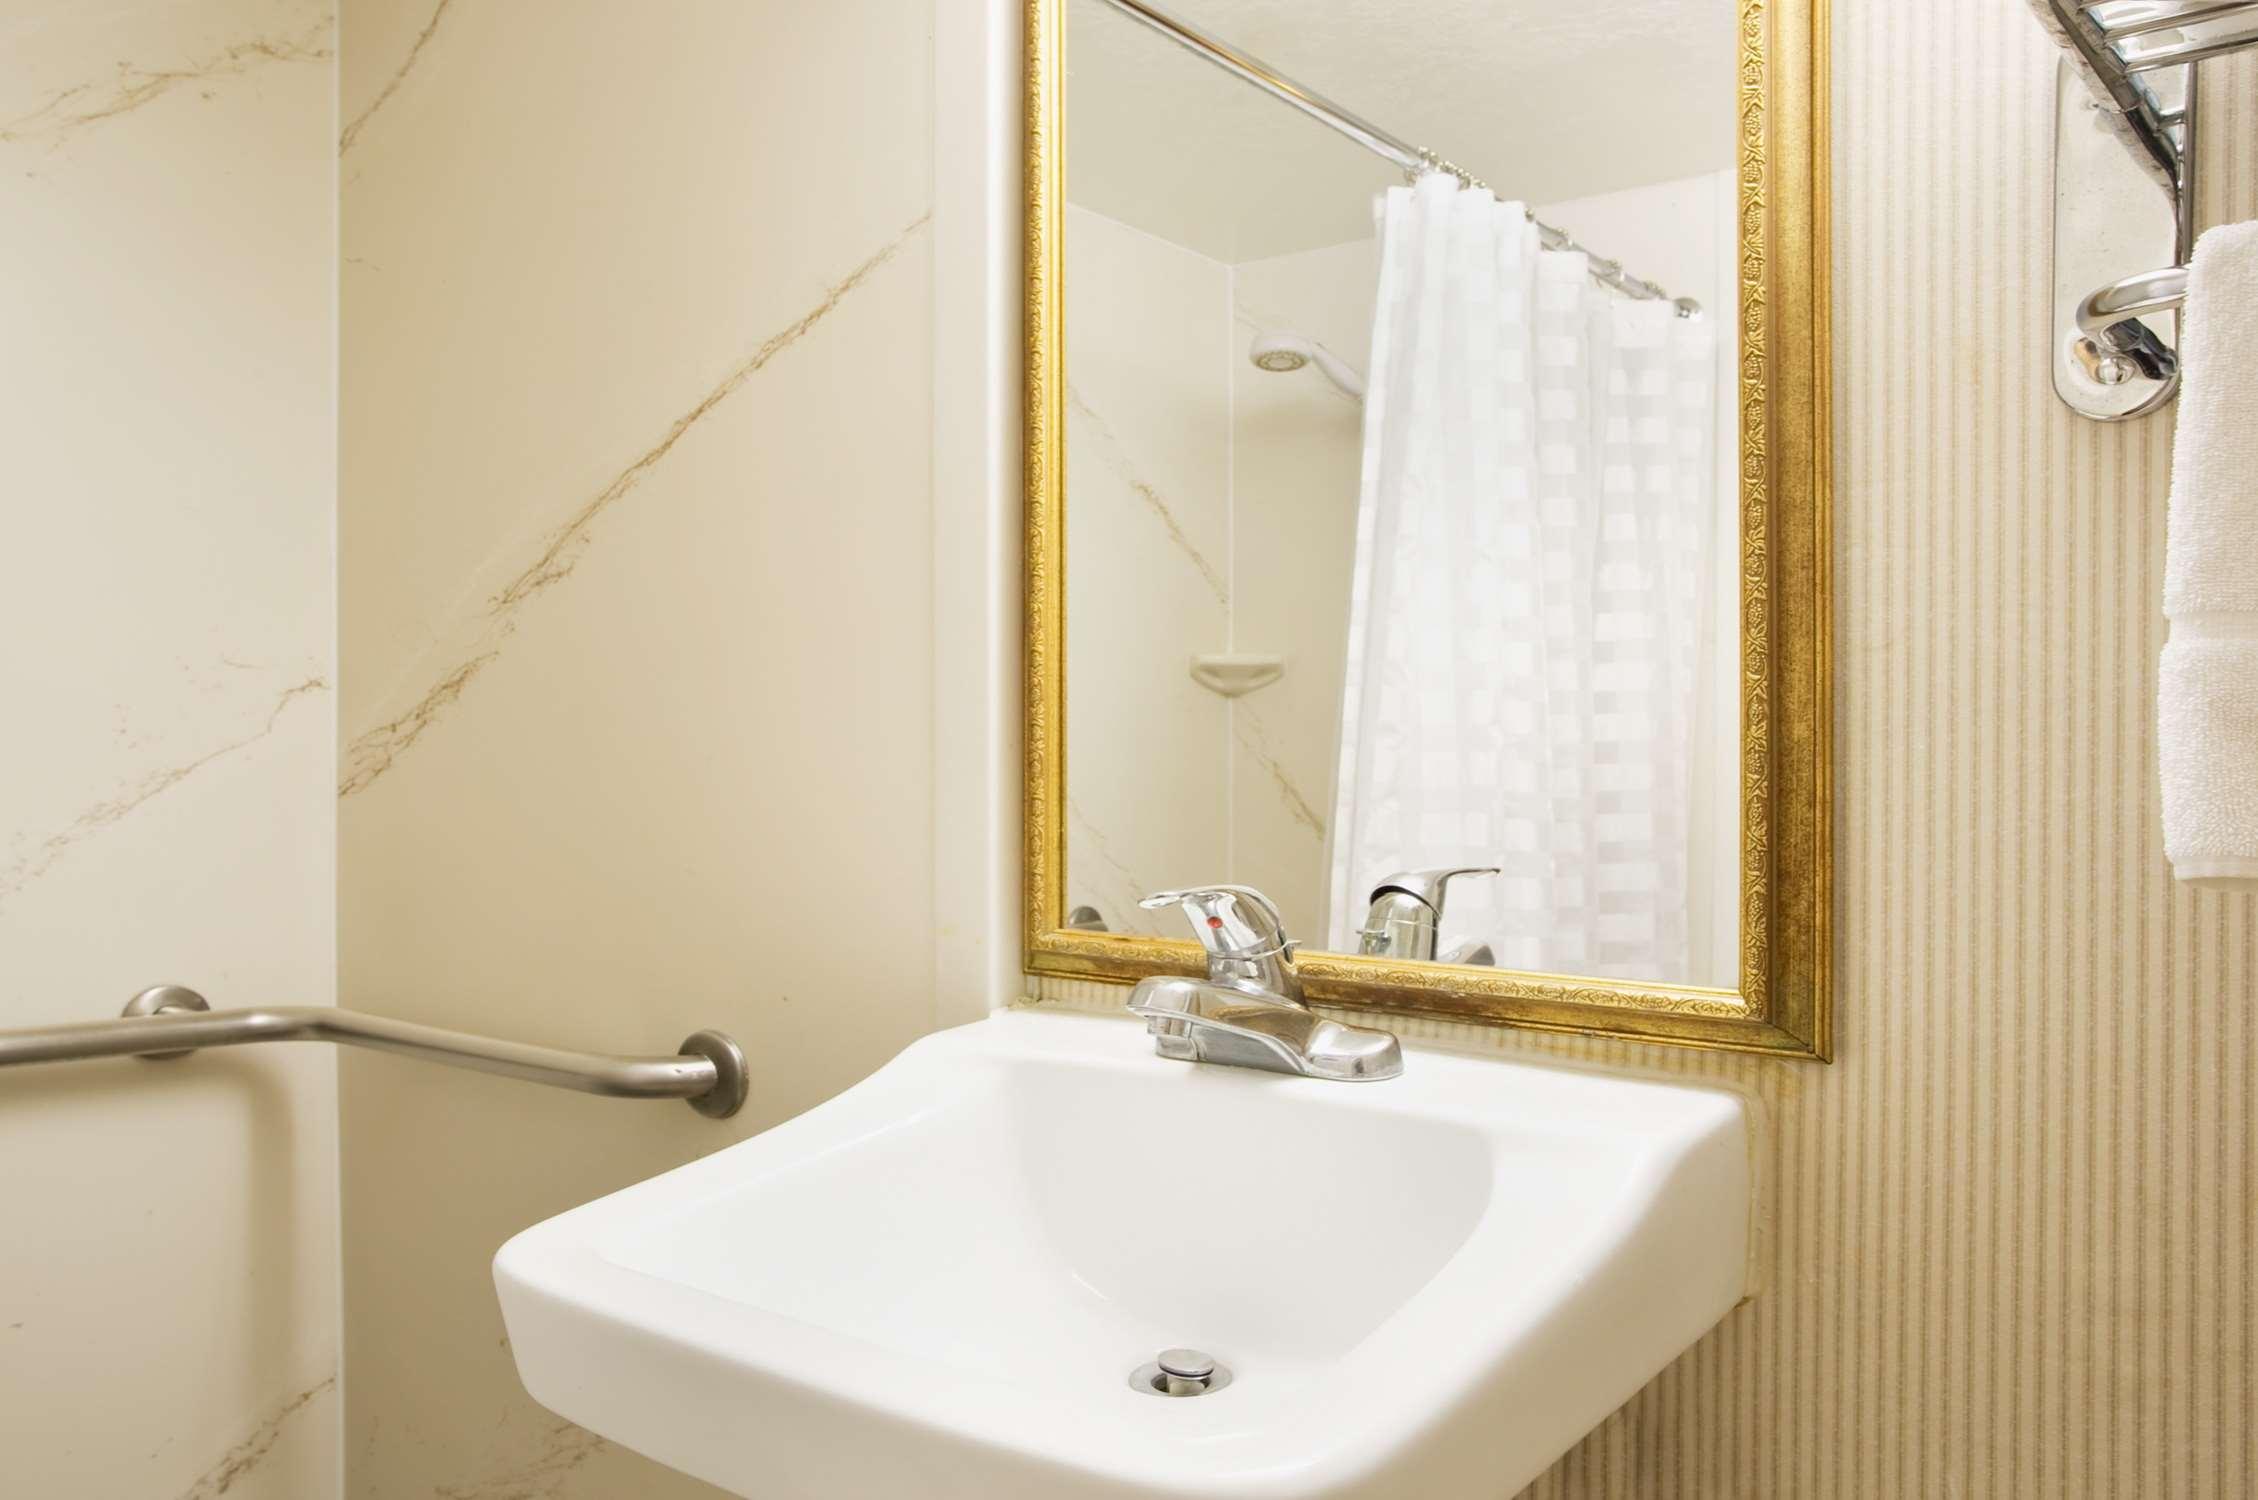 Embassy Suites by Hilton Arcadia Pasadena Area image 27